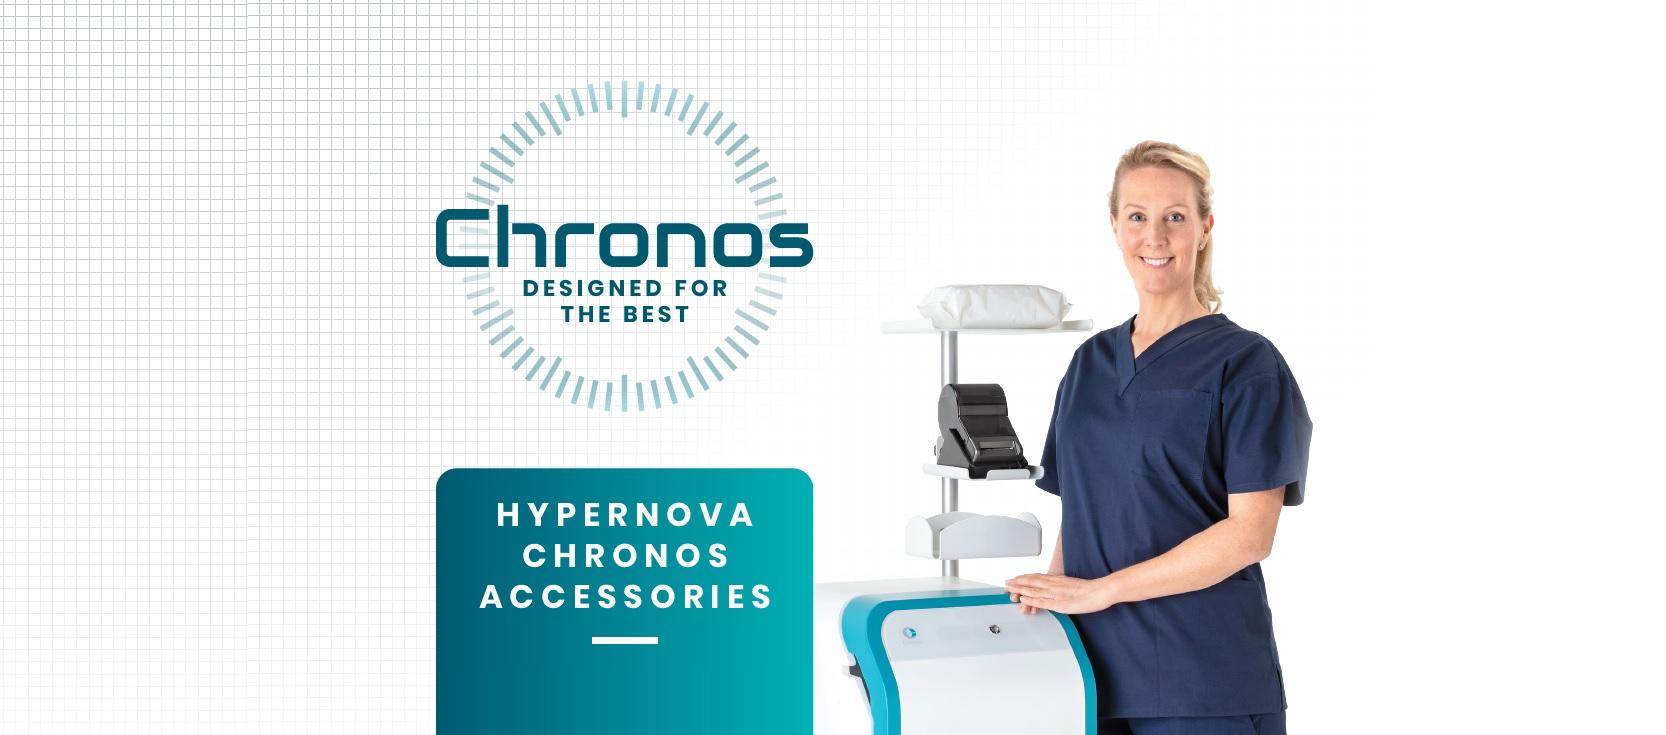 Hypernova Chronos Accessories